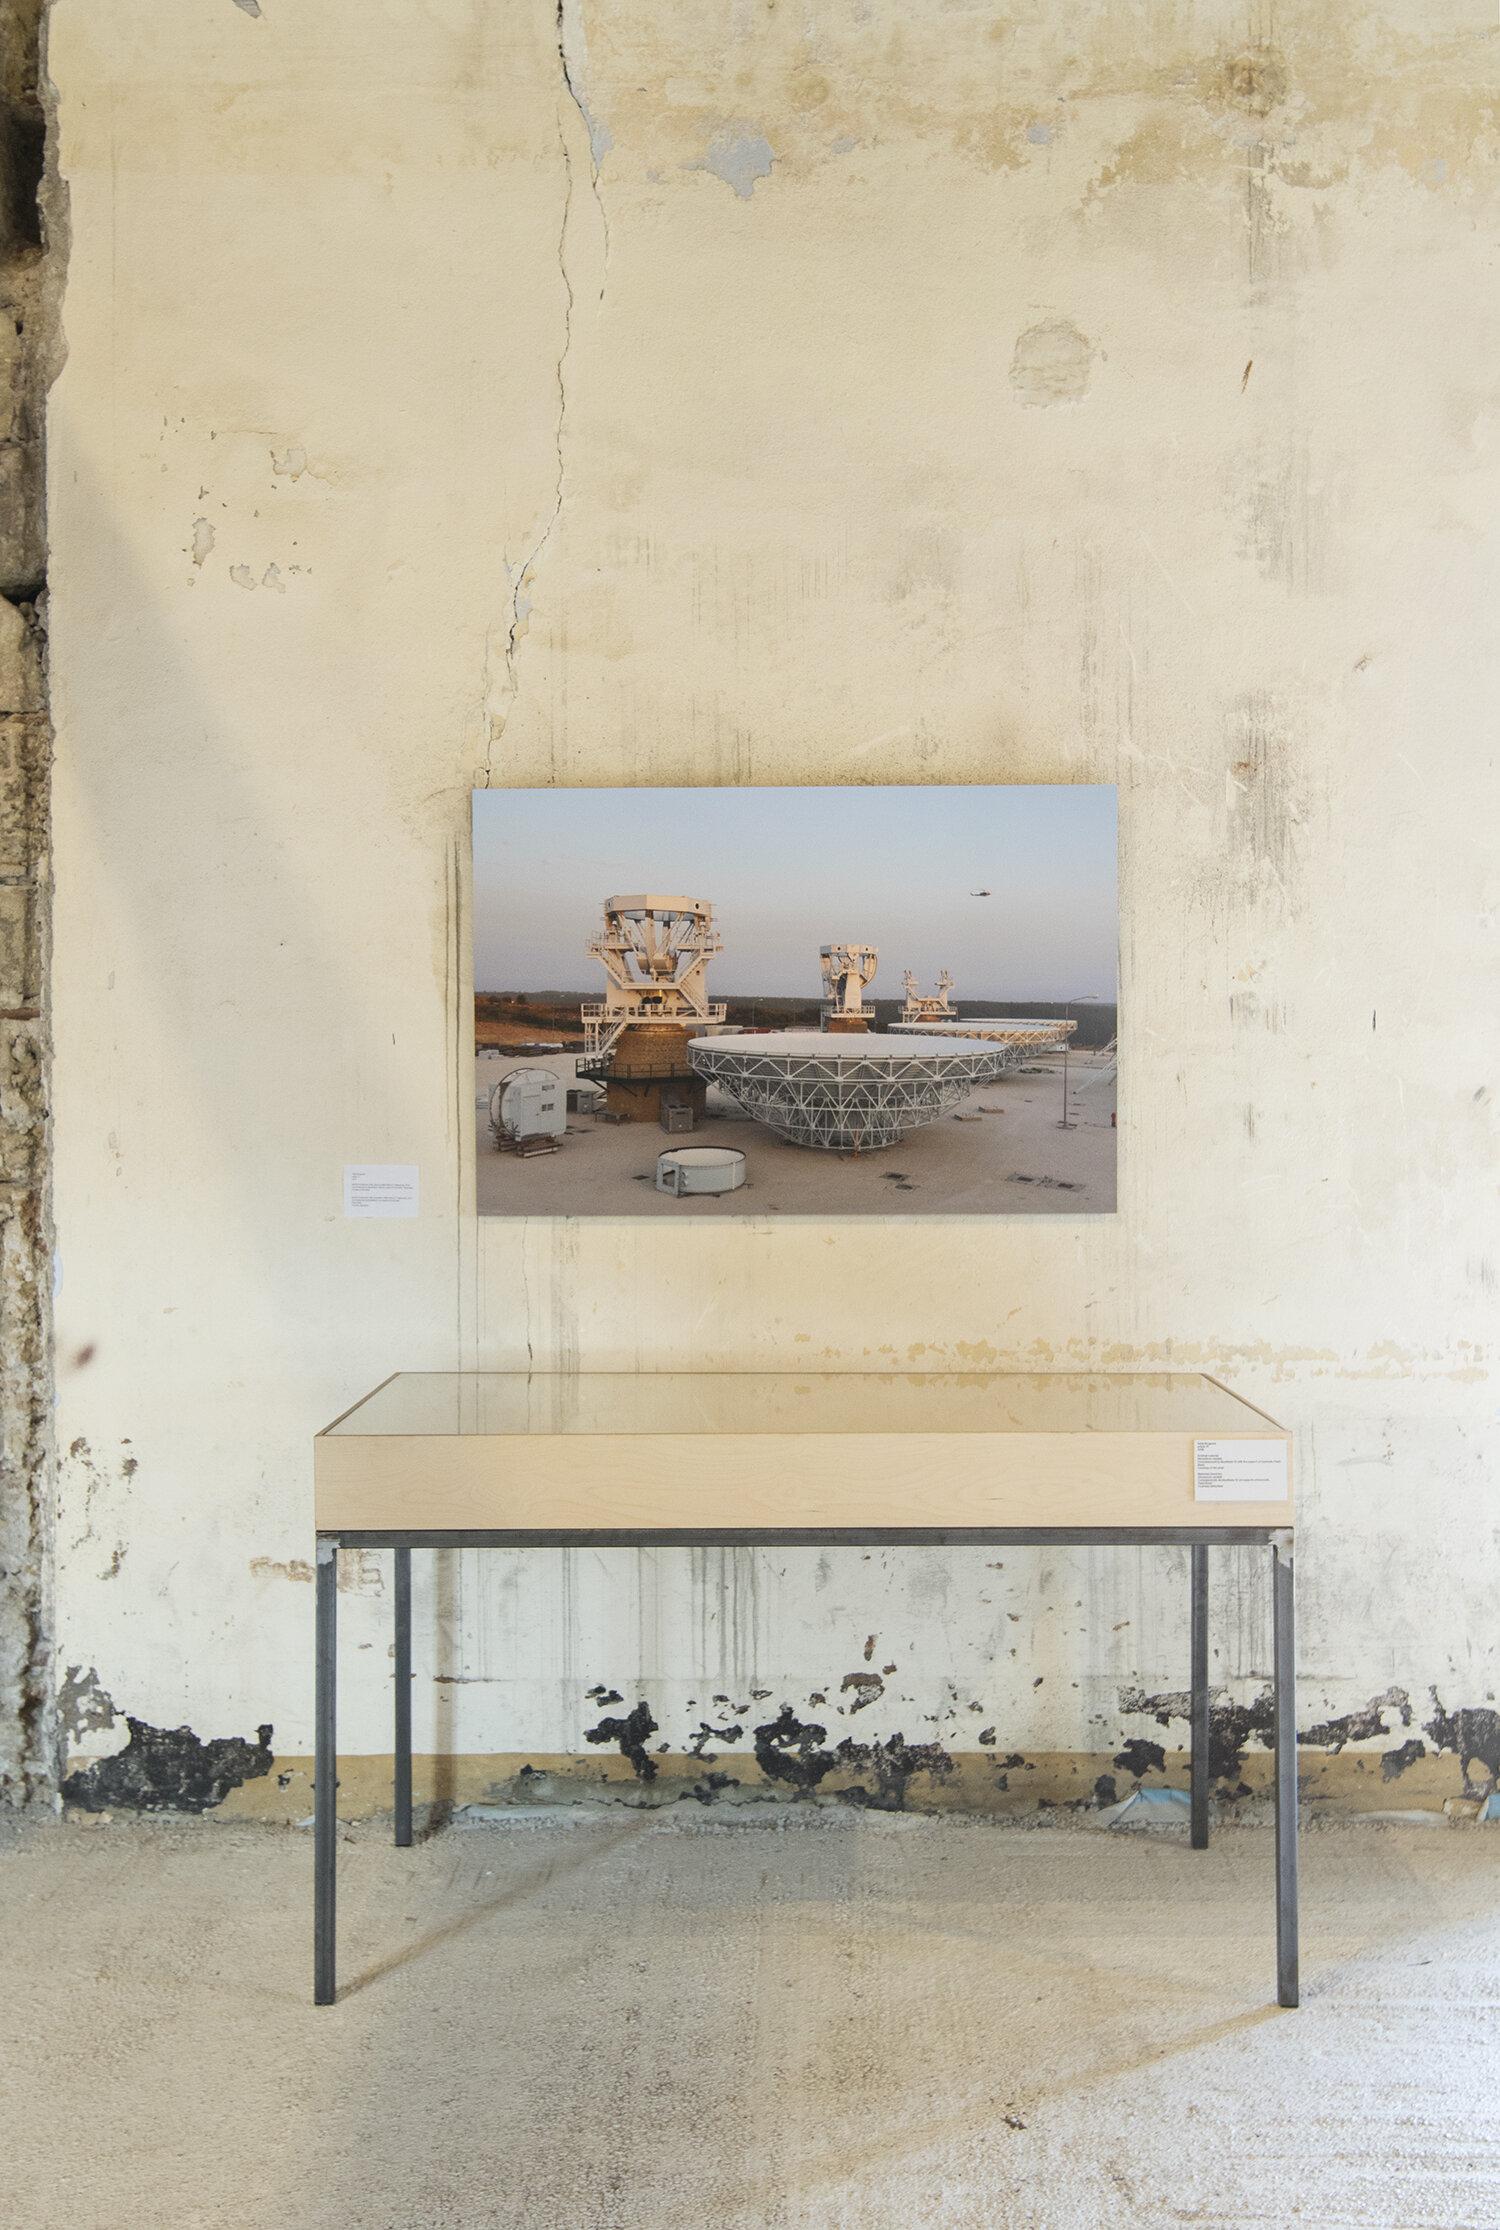 Tania Bruguera, Article 11. Manifesta 12. Foto © I DO ART Agency.